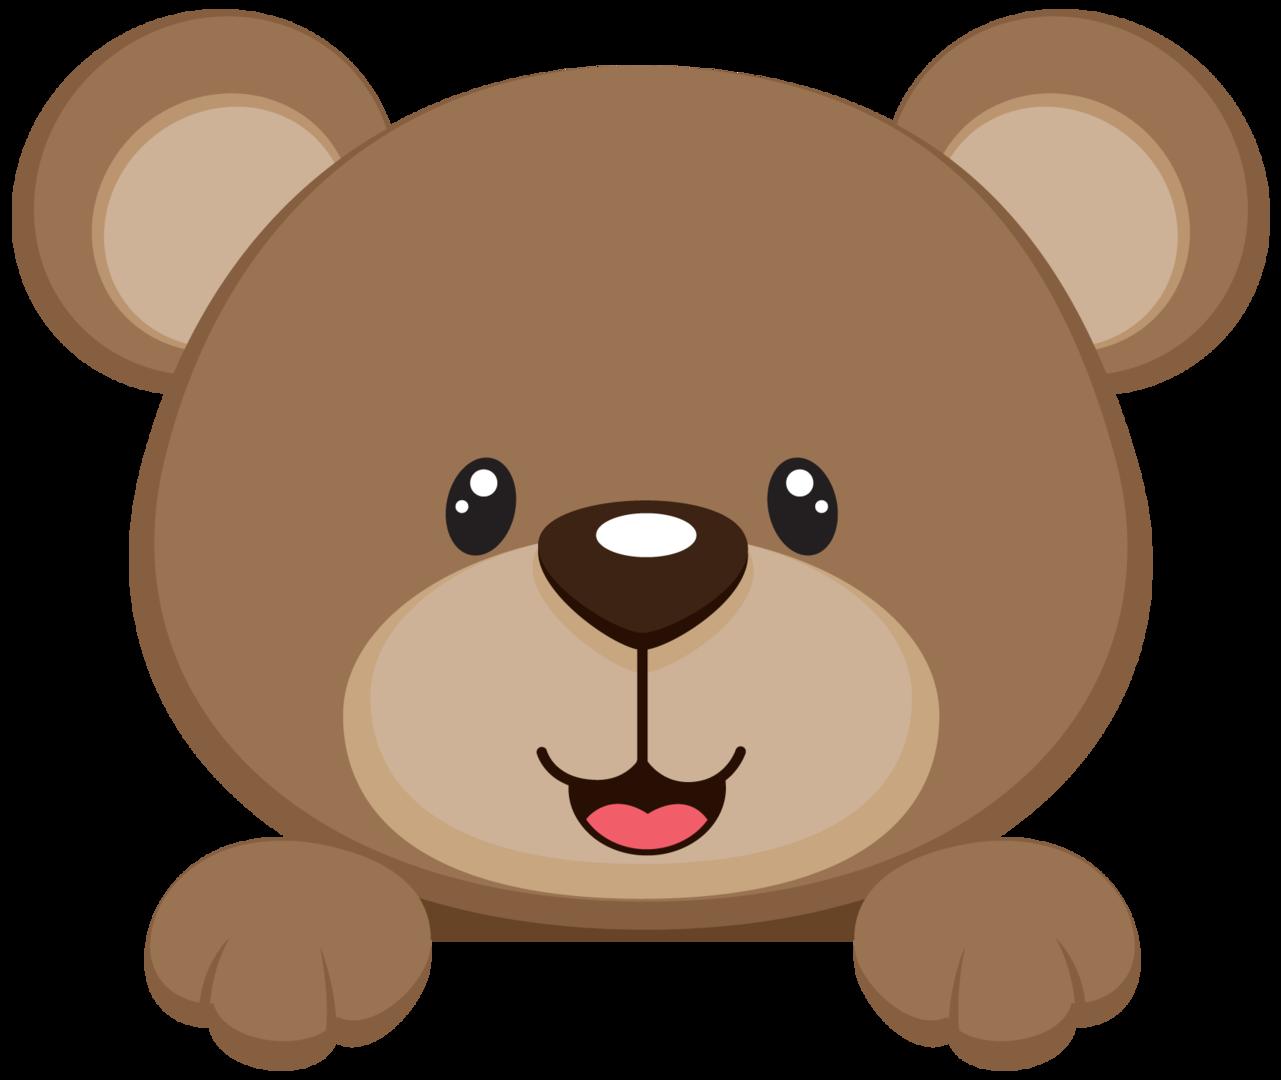 Bear shower infant child. Nut clipart baby